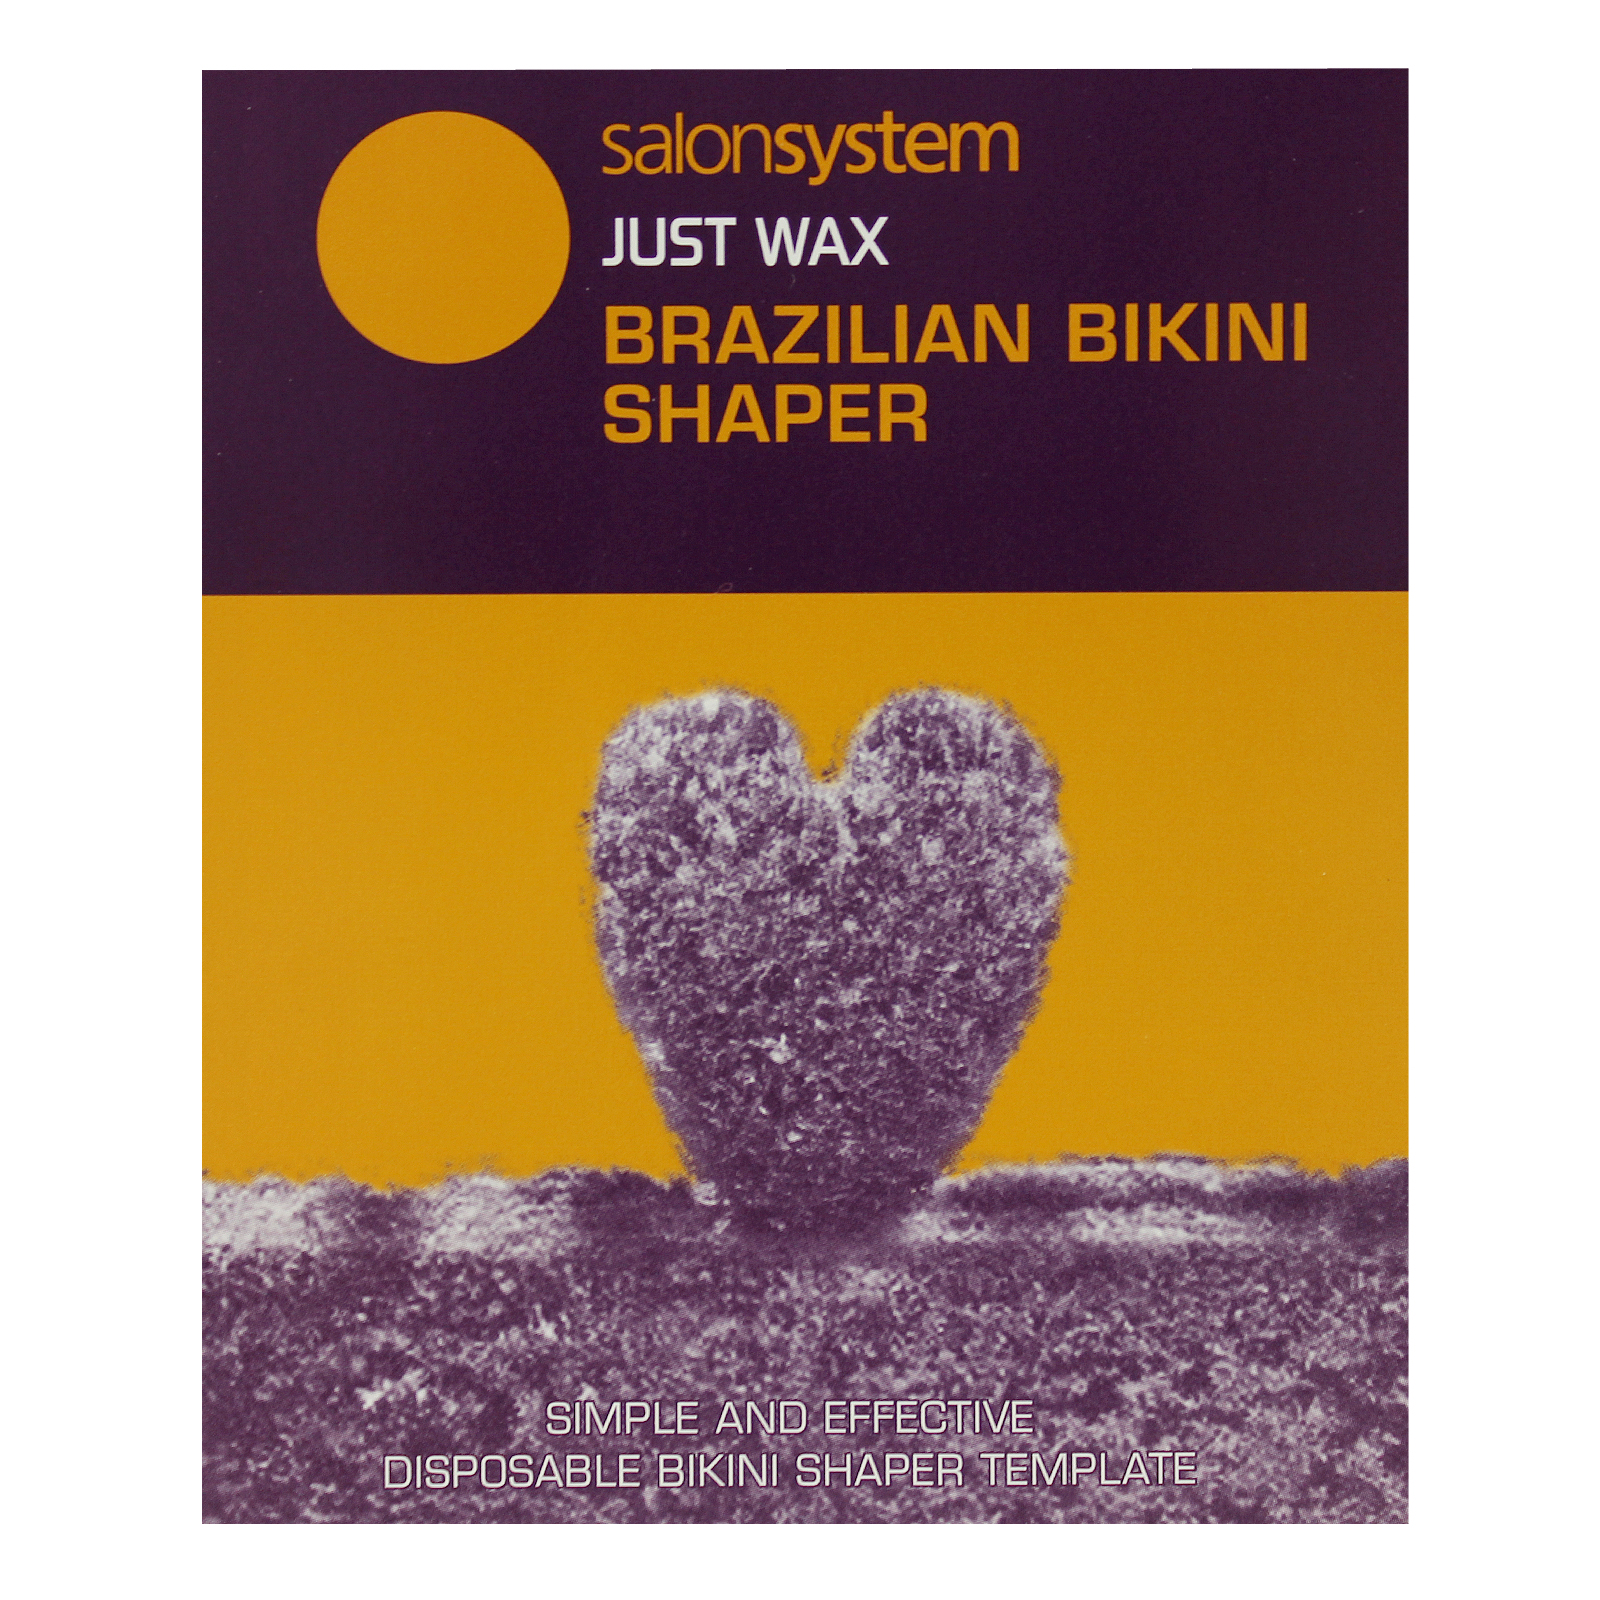 Bikini Wax Brazilian Waxing Template Hair Removal Body Salon System ...